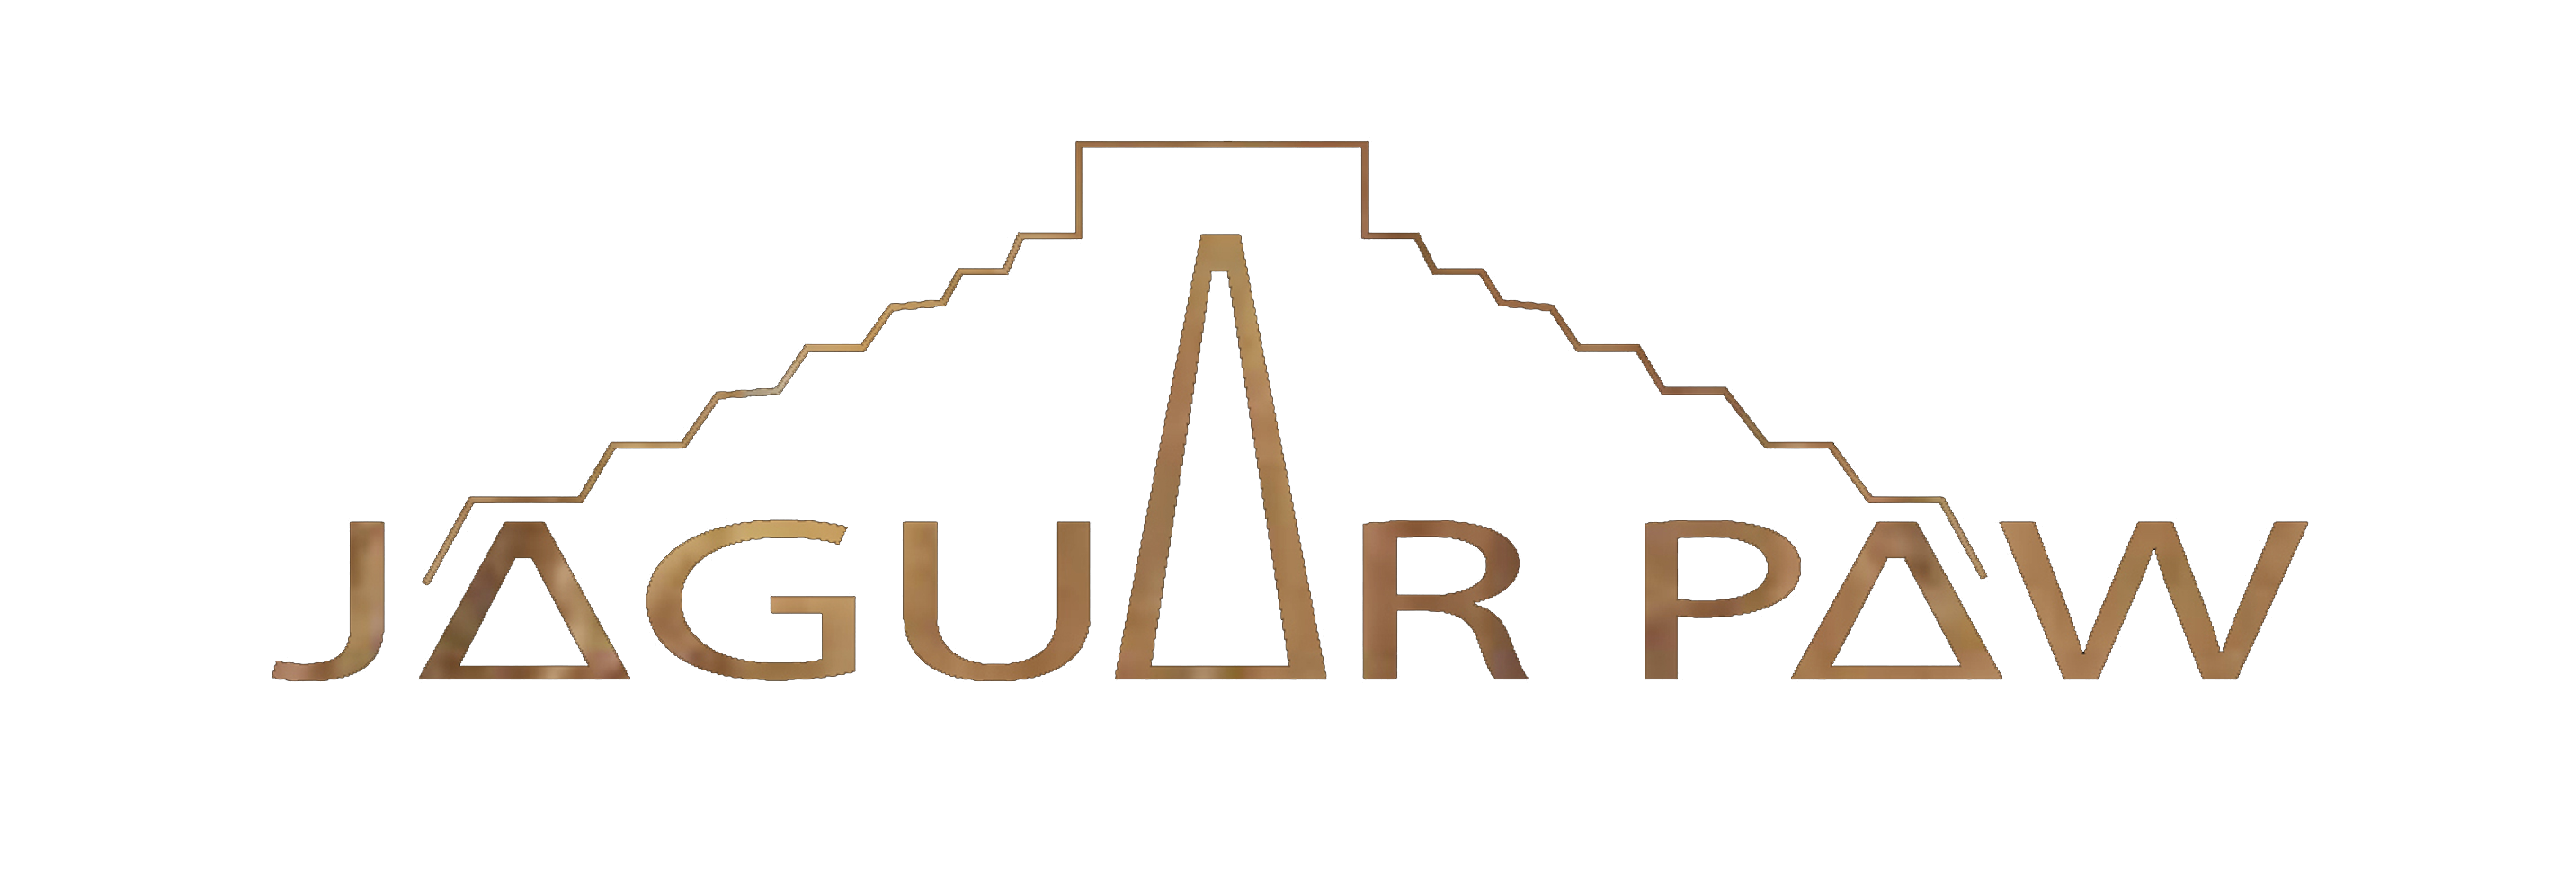 Jaguar Paw Lifestyle